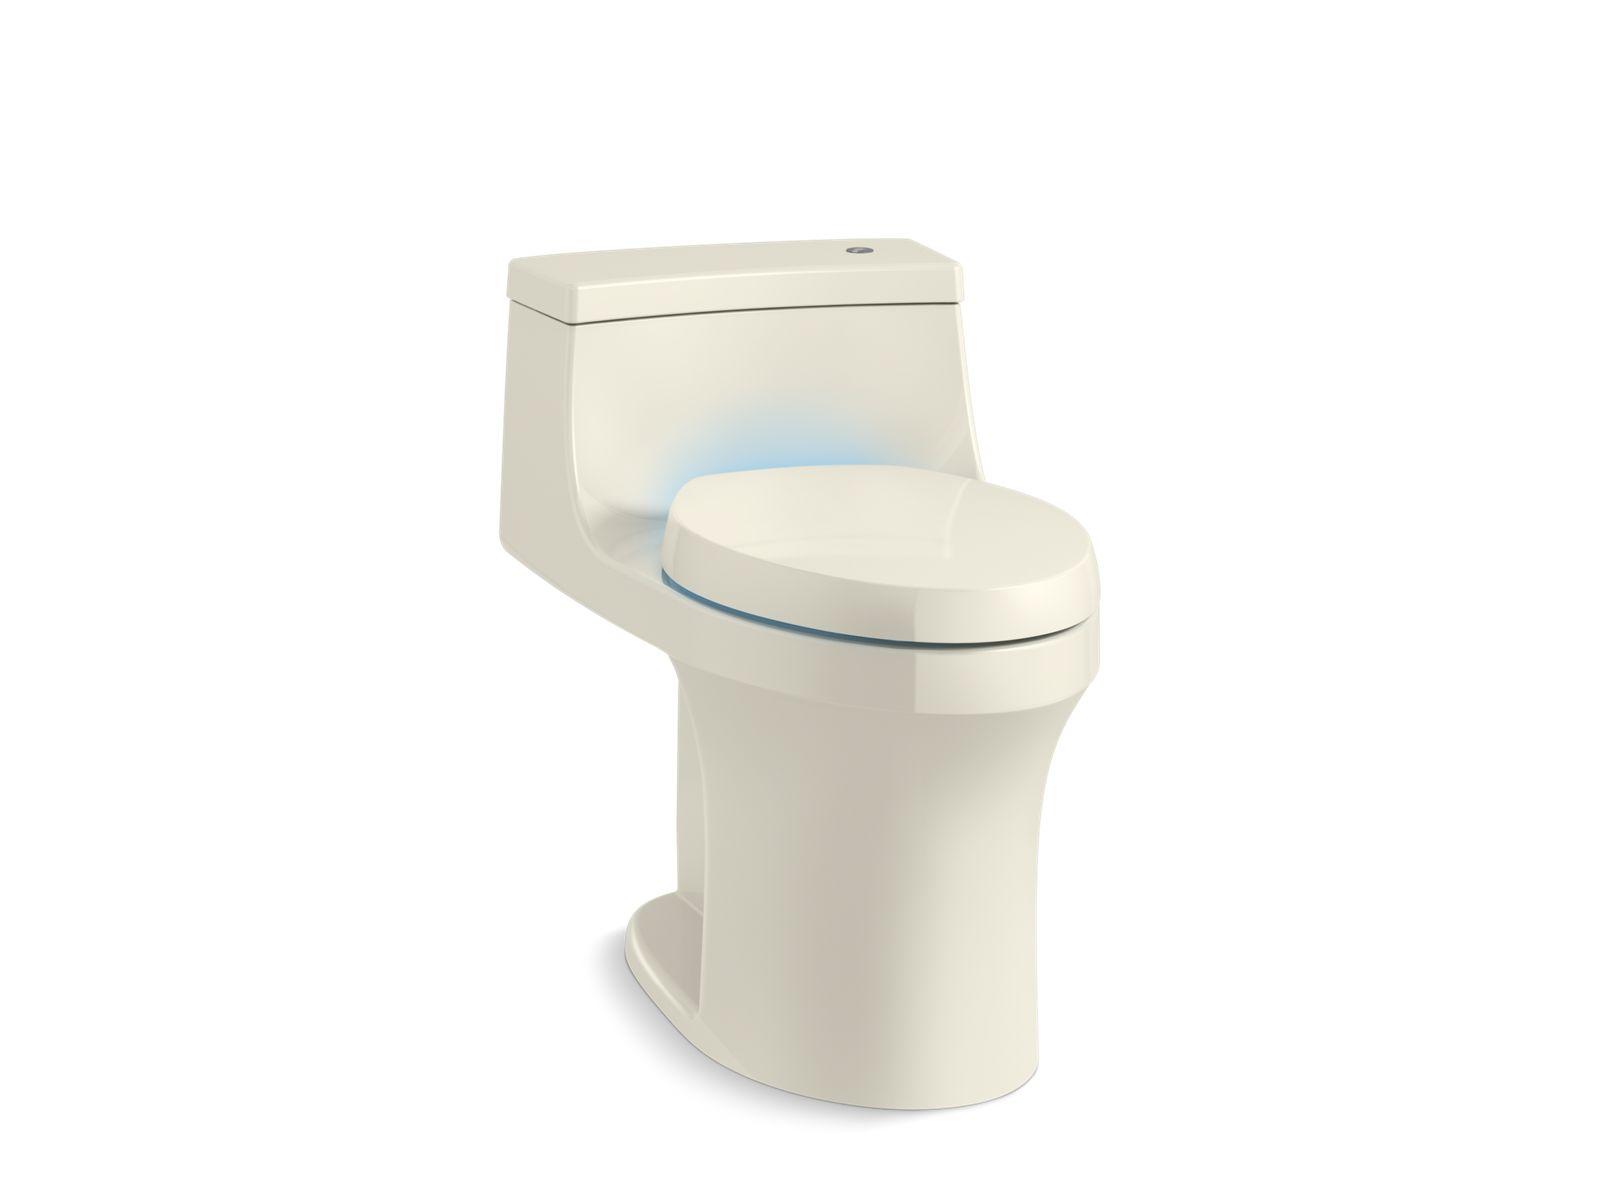 K-8687 | San Souci Touchless with Purefresh Toilet, 1.28 GPF | KOHLER